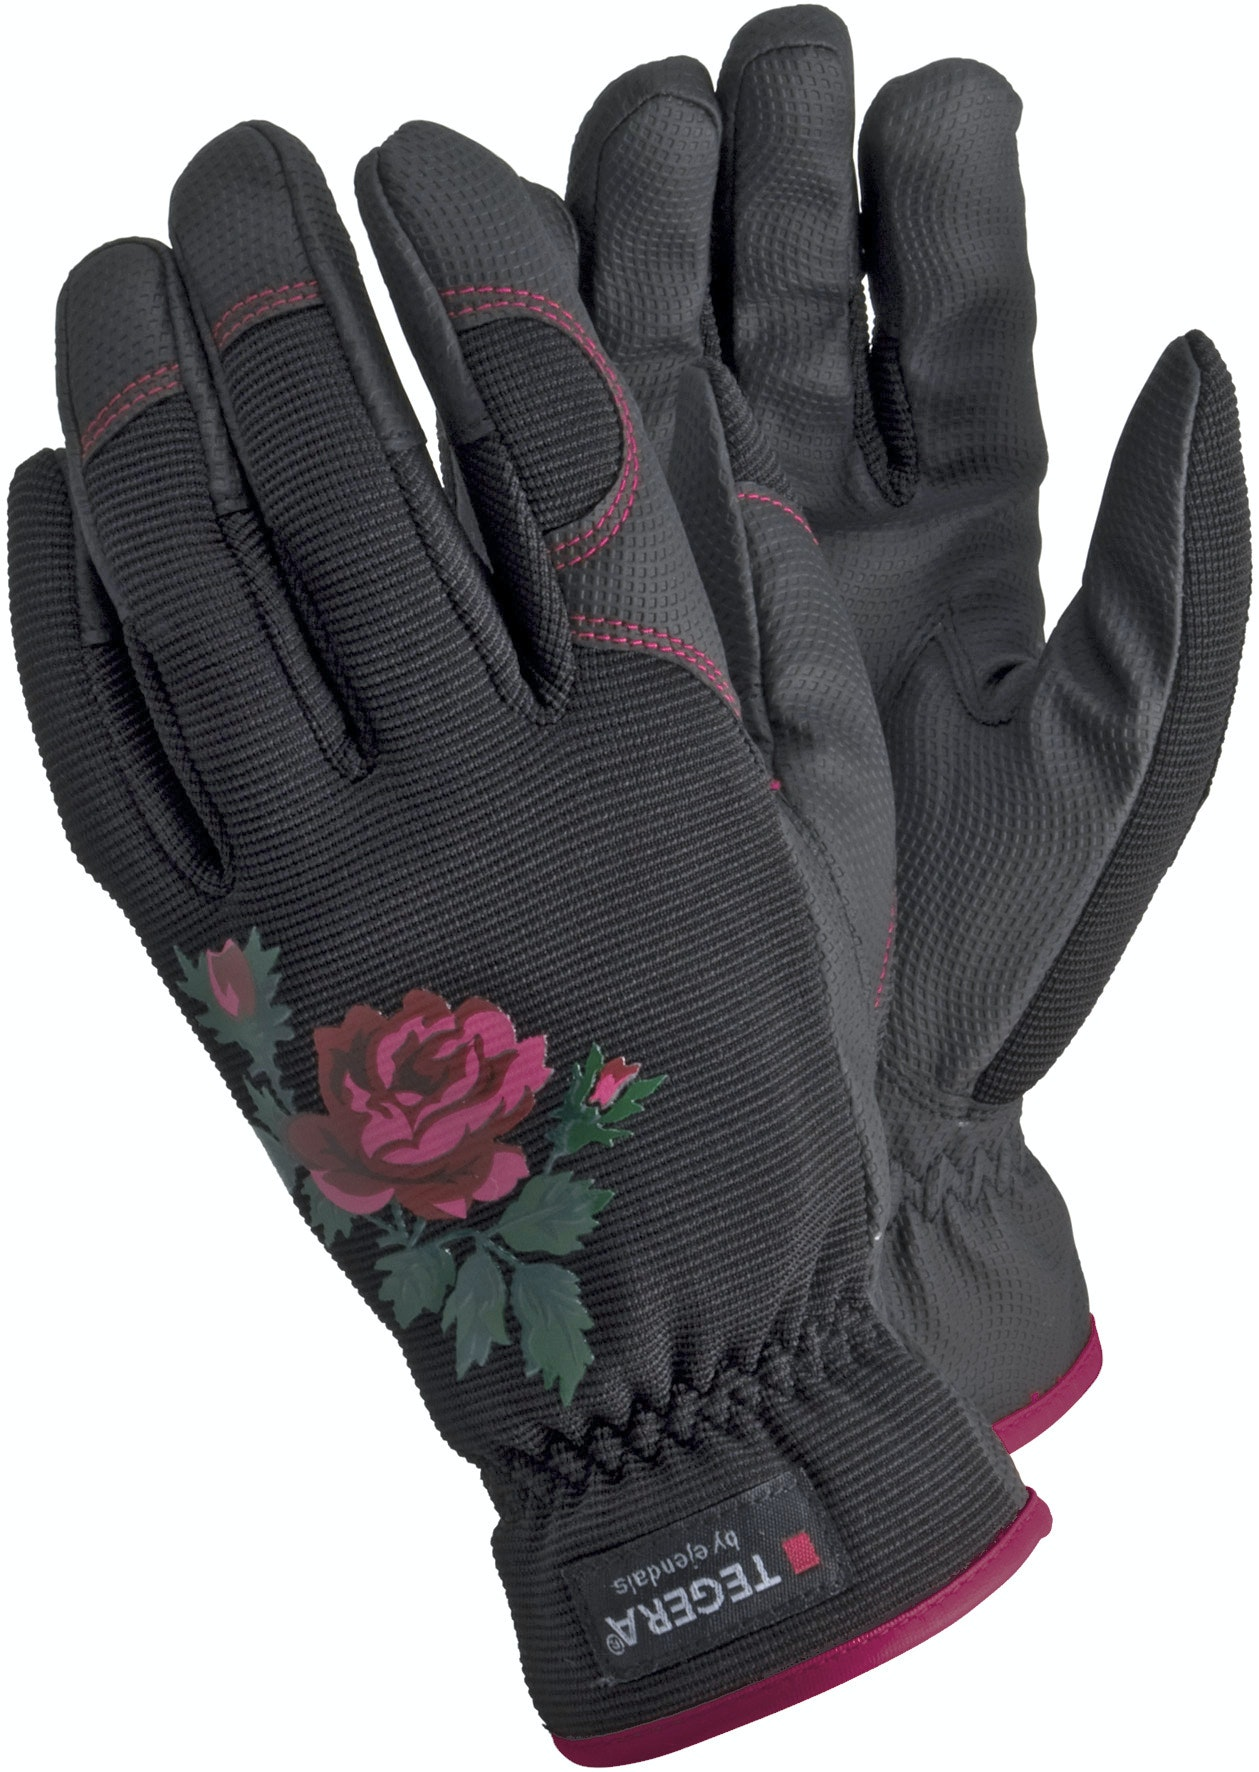 Handske Tegera 90030 Micro-Pu Stl 8